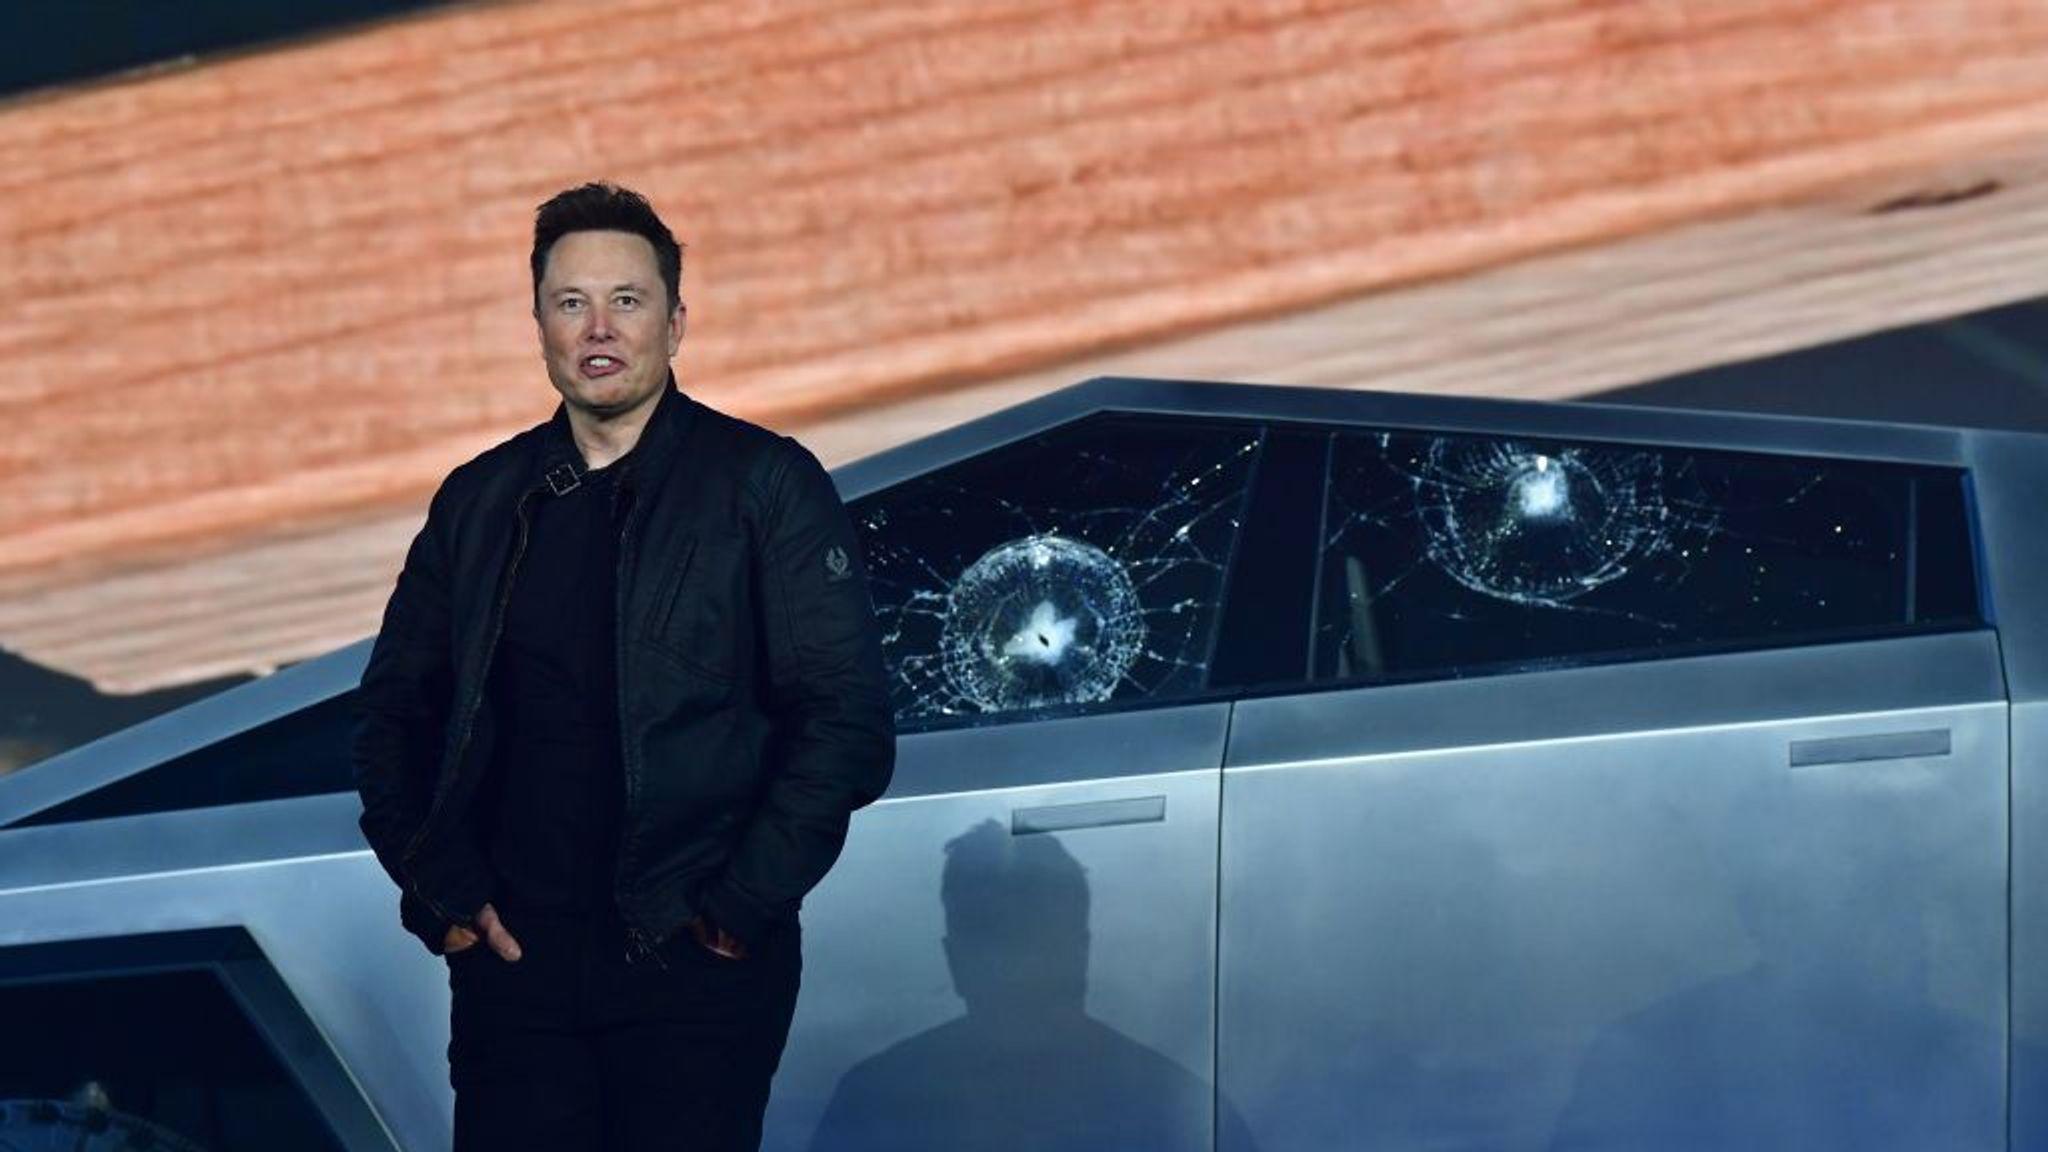 Tesla Cybertruck's windows shatter in embarrassing demonstration